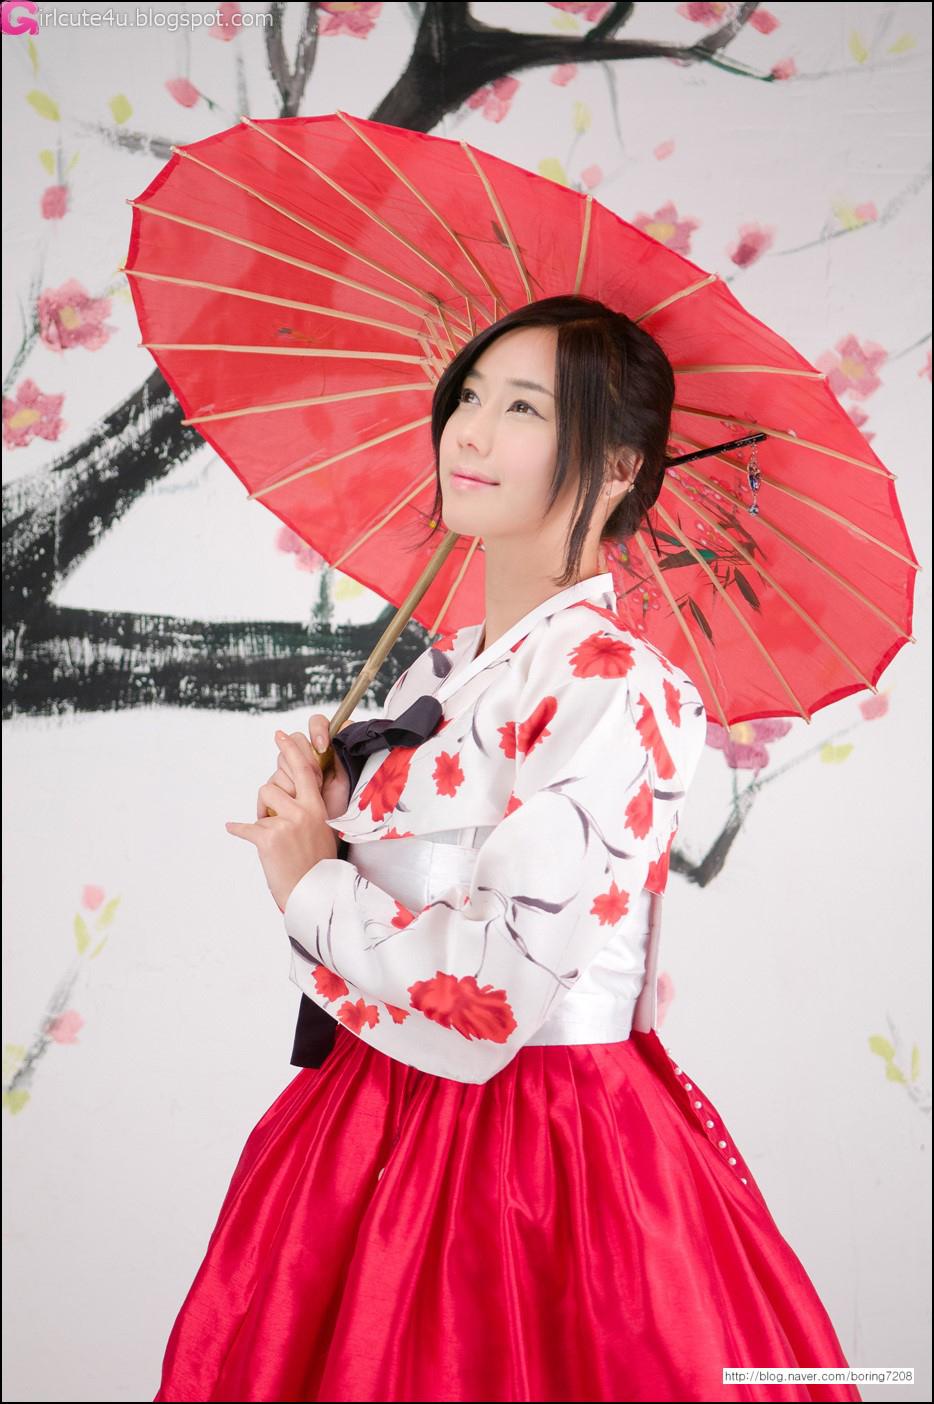 xxx nude girls: Kim Ha Yul in Hanbok